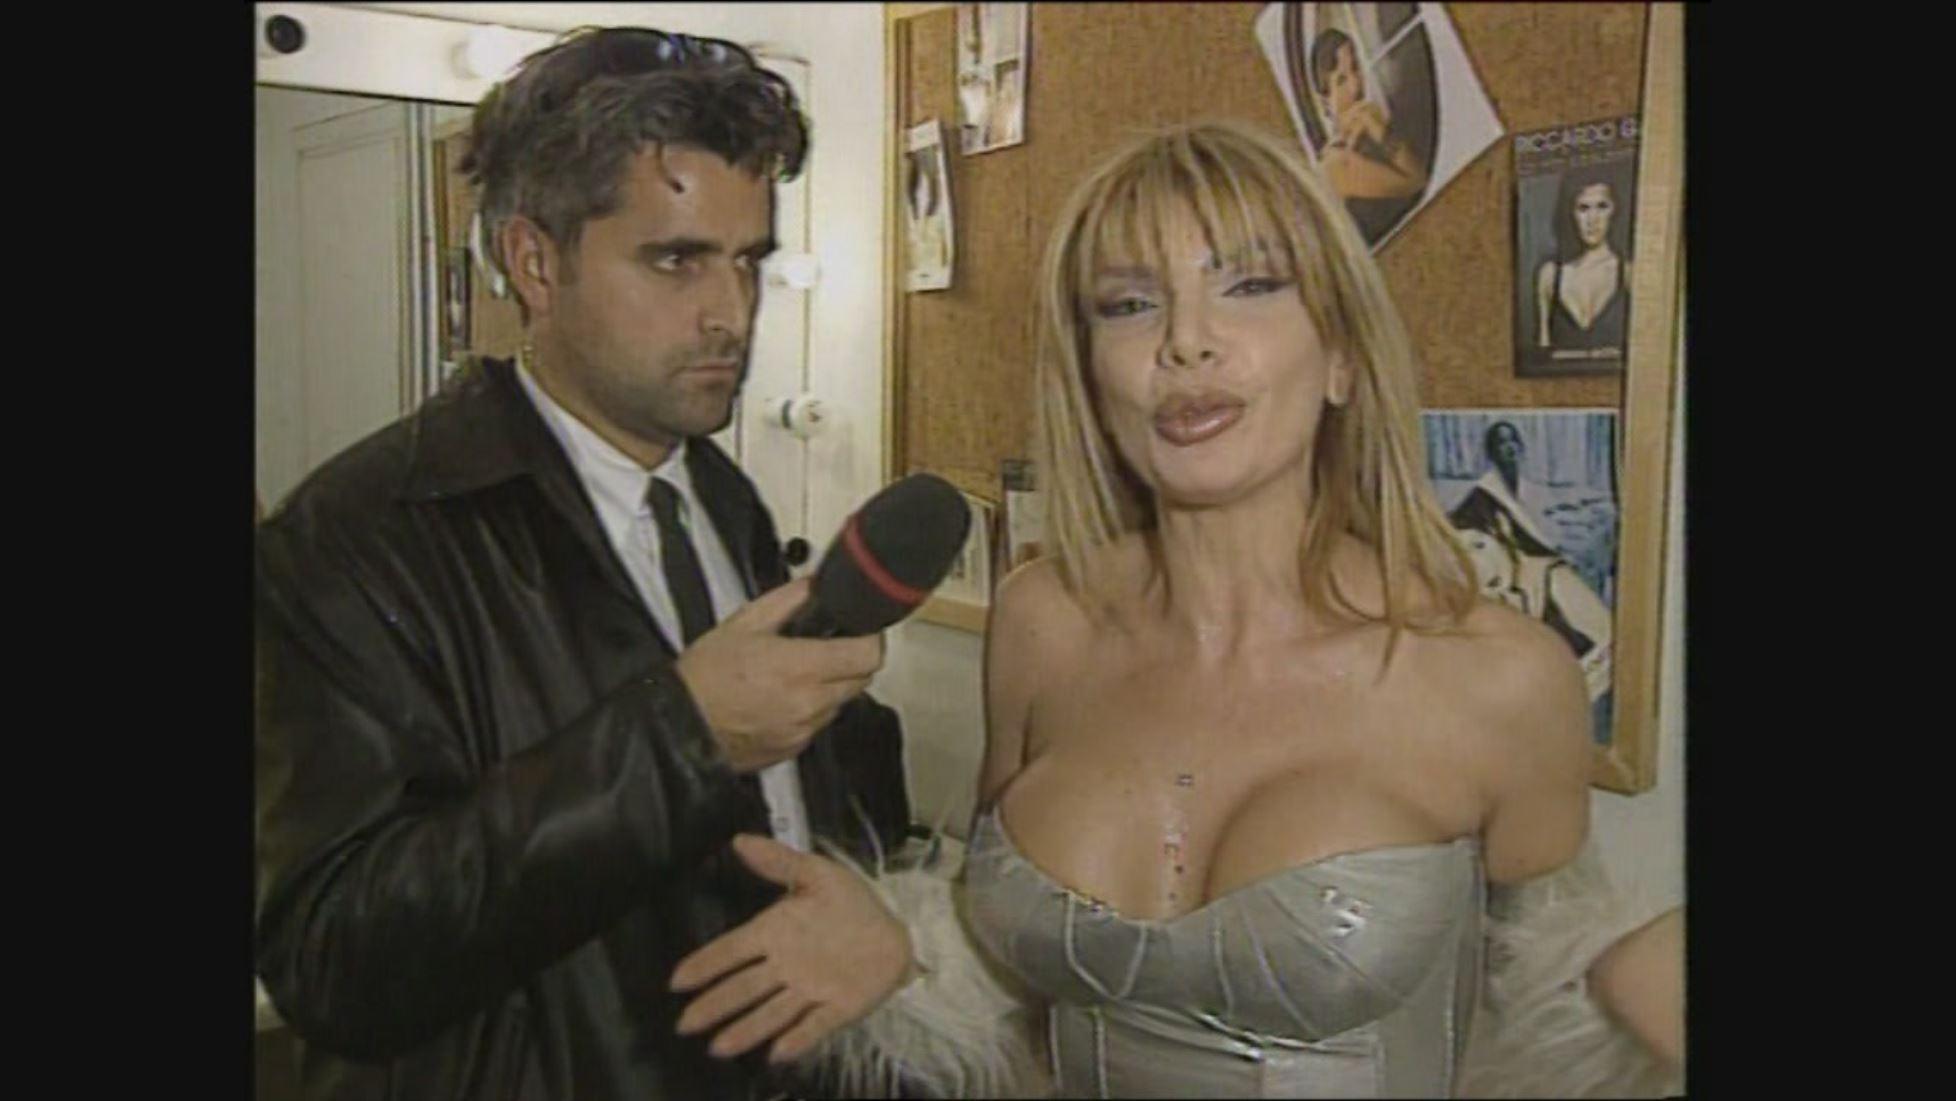 Ana Bettz cantautrice - Le Iene Video